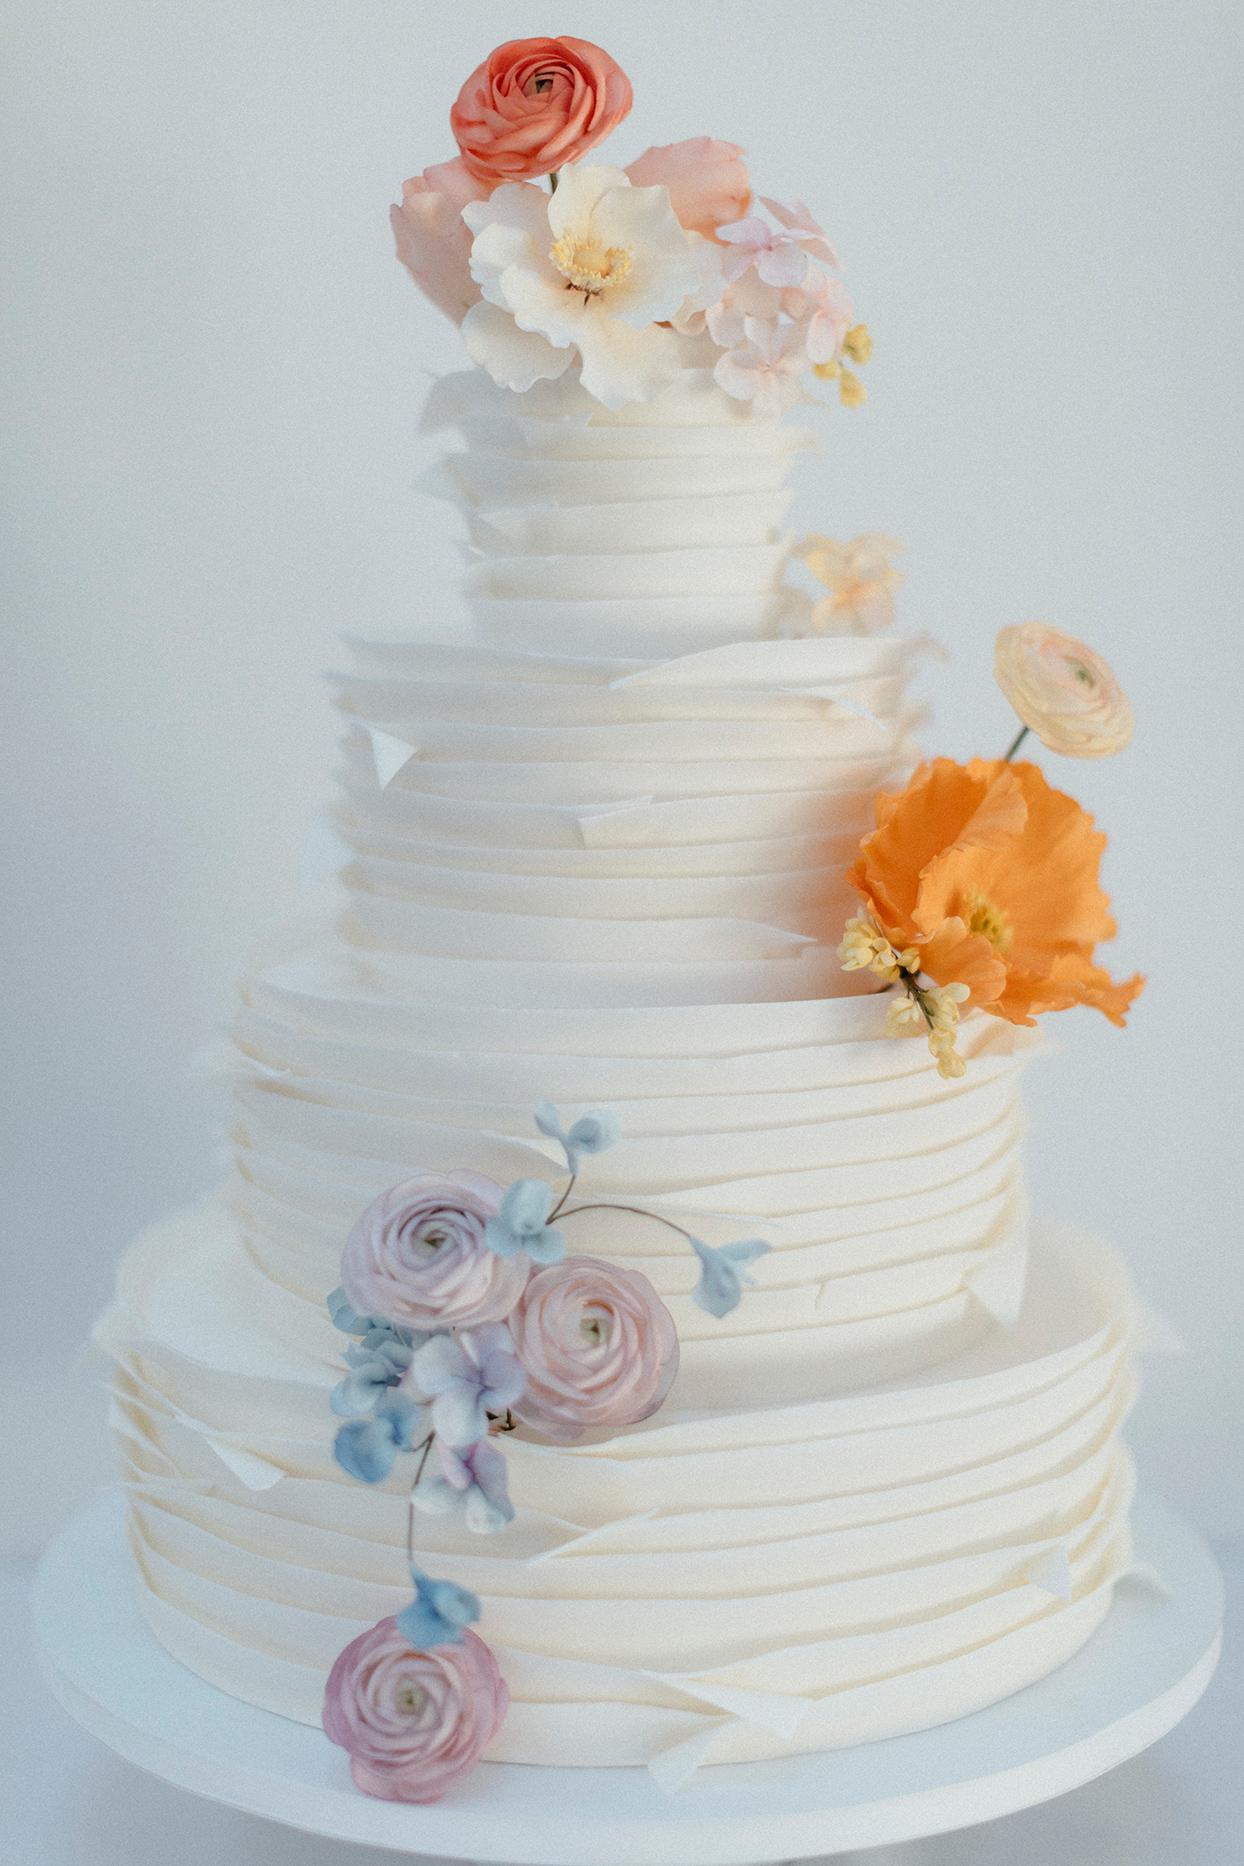 kristen jonathan modern wedding cake with flowers